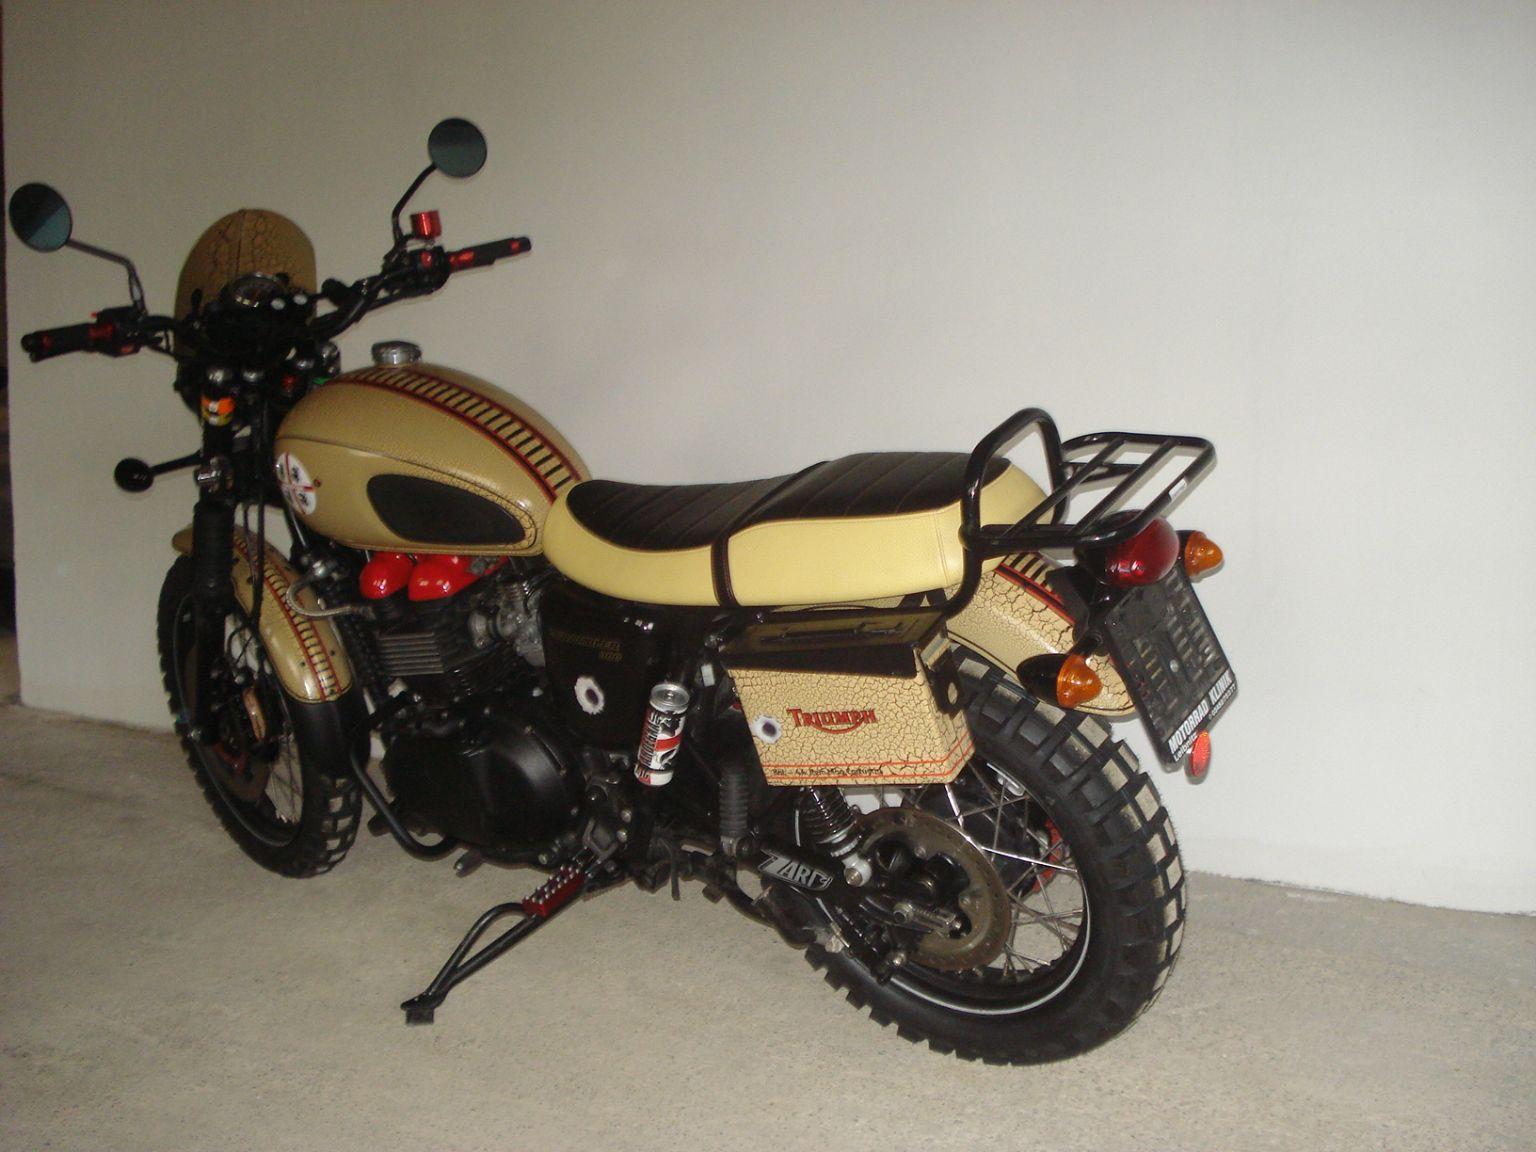 umgebautes motorrad triumph scrambler von christoph gruber. Black Bedroom Furniture Sets. Home Design Ideas